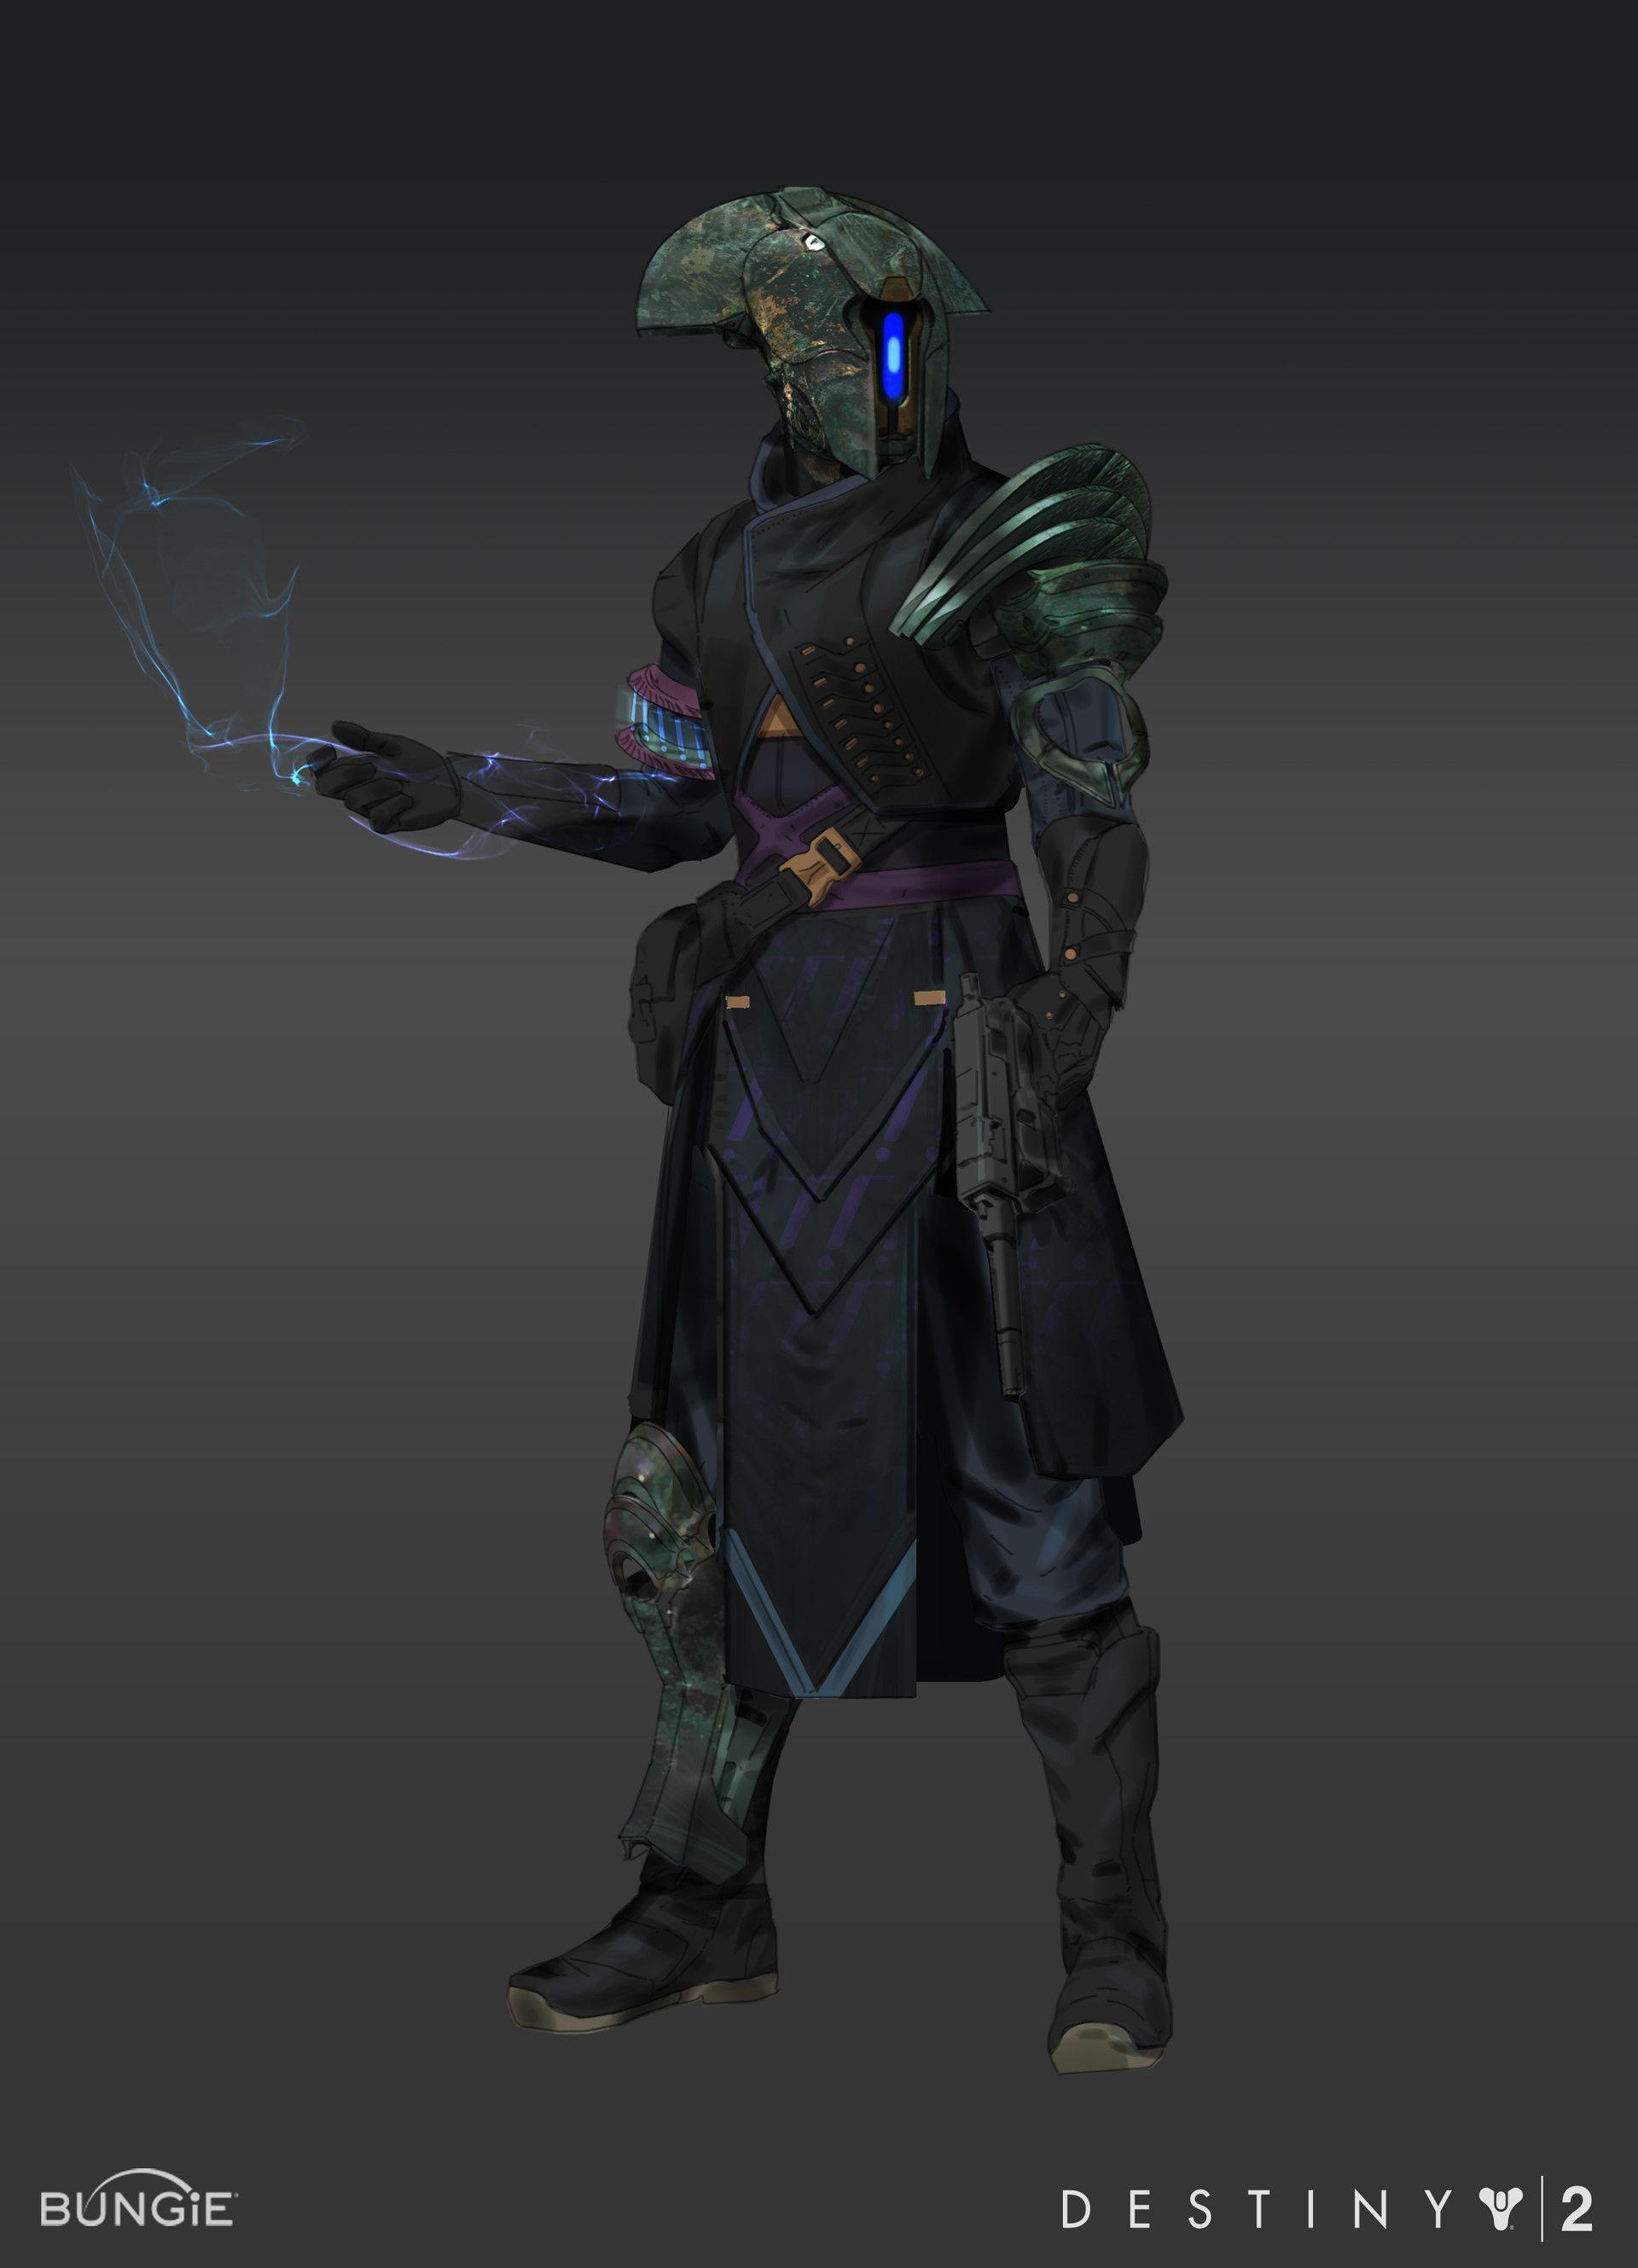 ArtStation - Destiny 2 - Curse of Osiris Armor Sets, Tyler